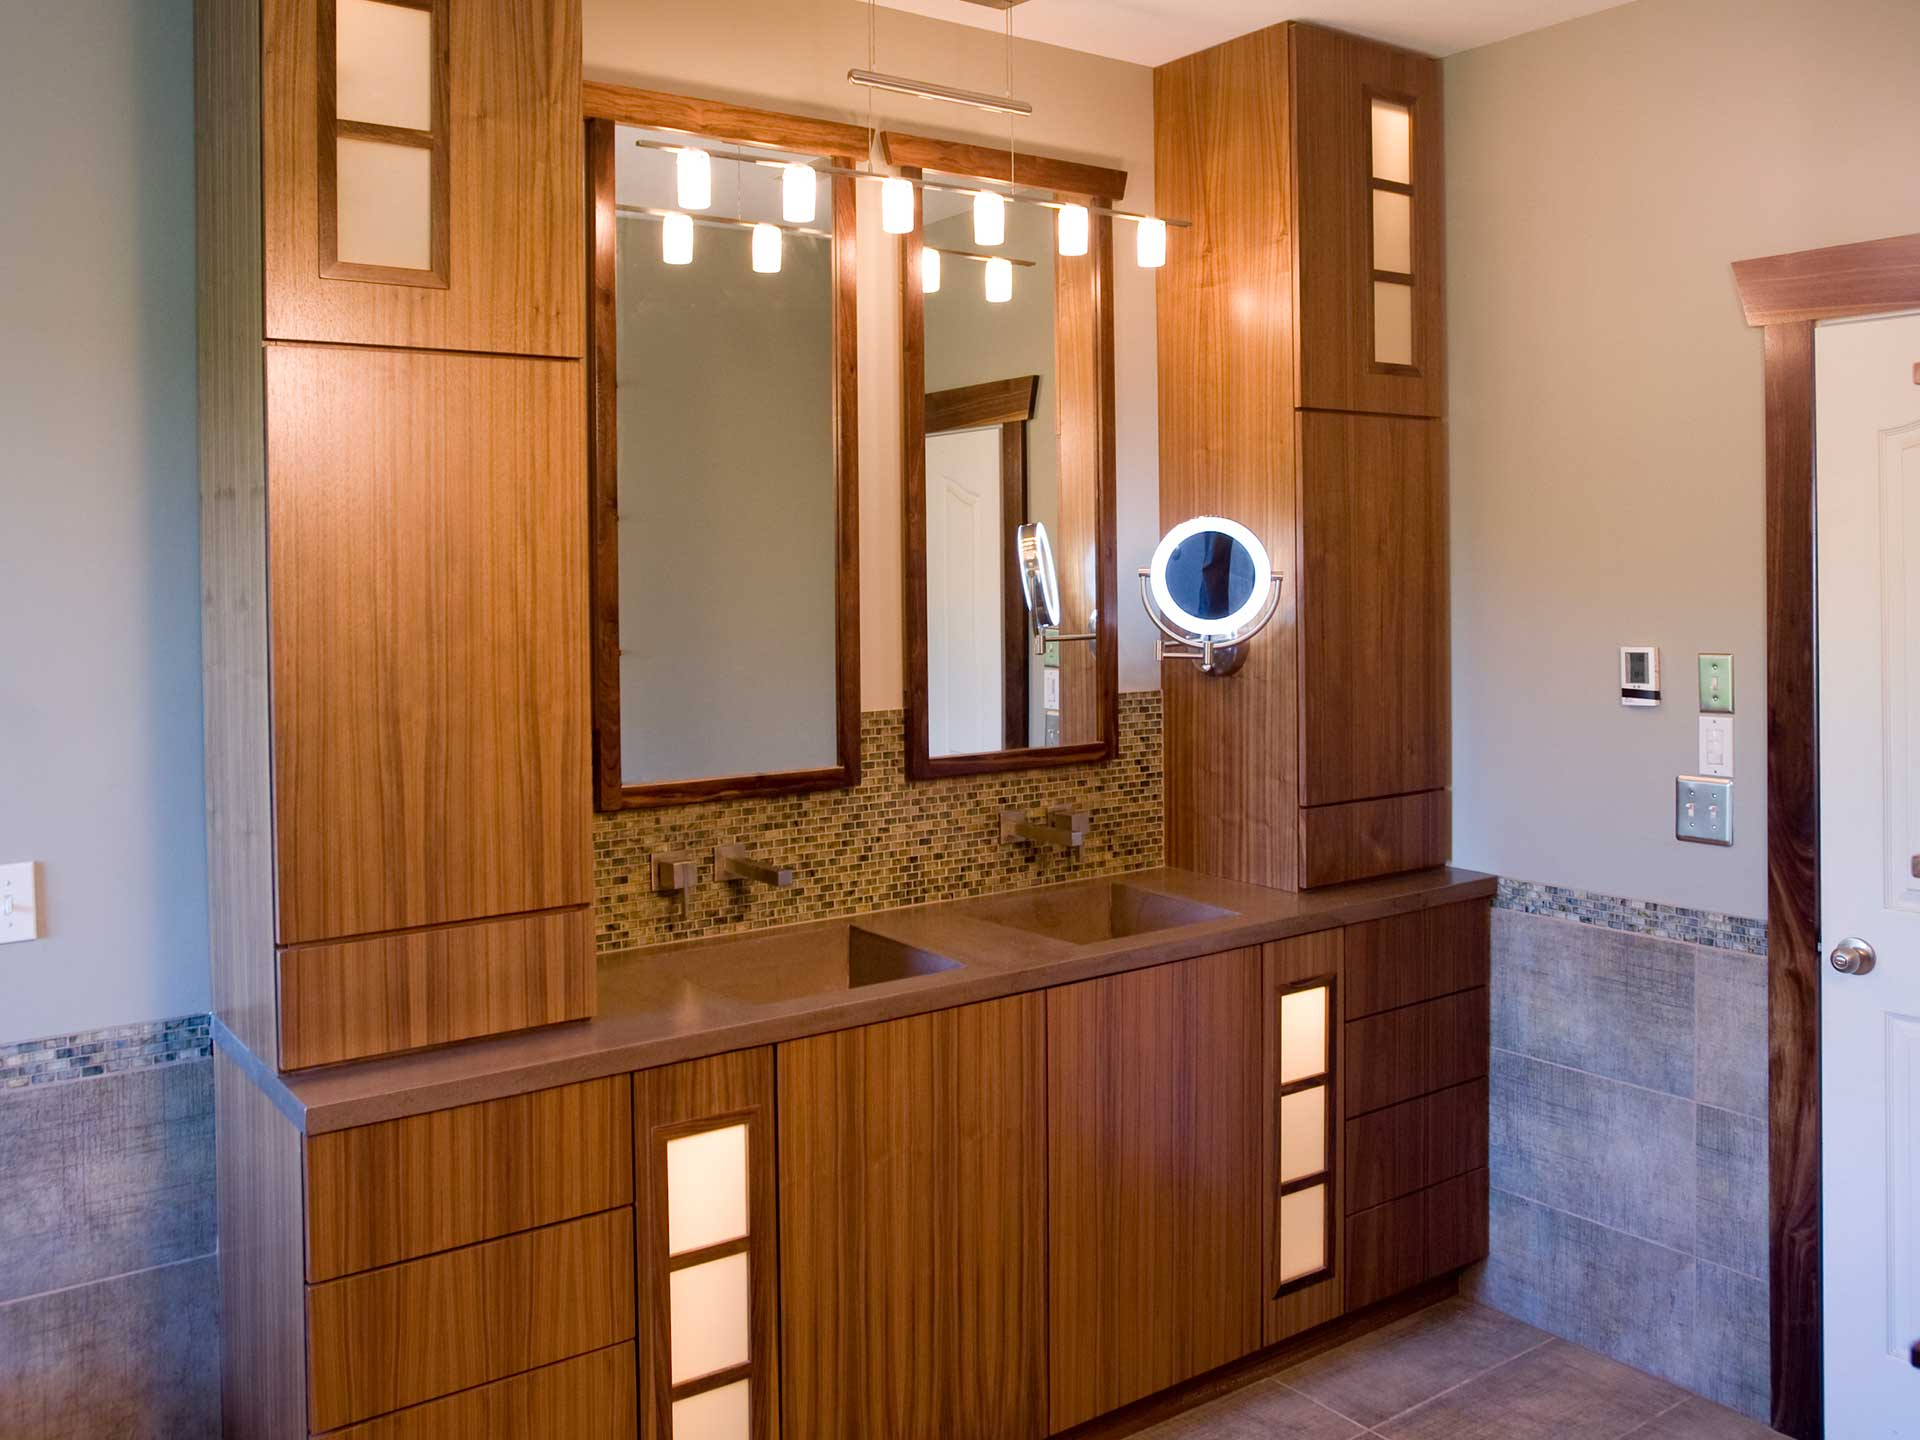 midwest-remodeling-bathroom-remodel-6